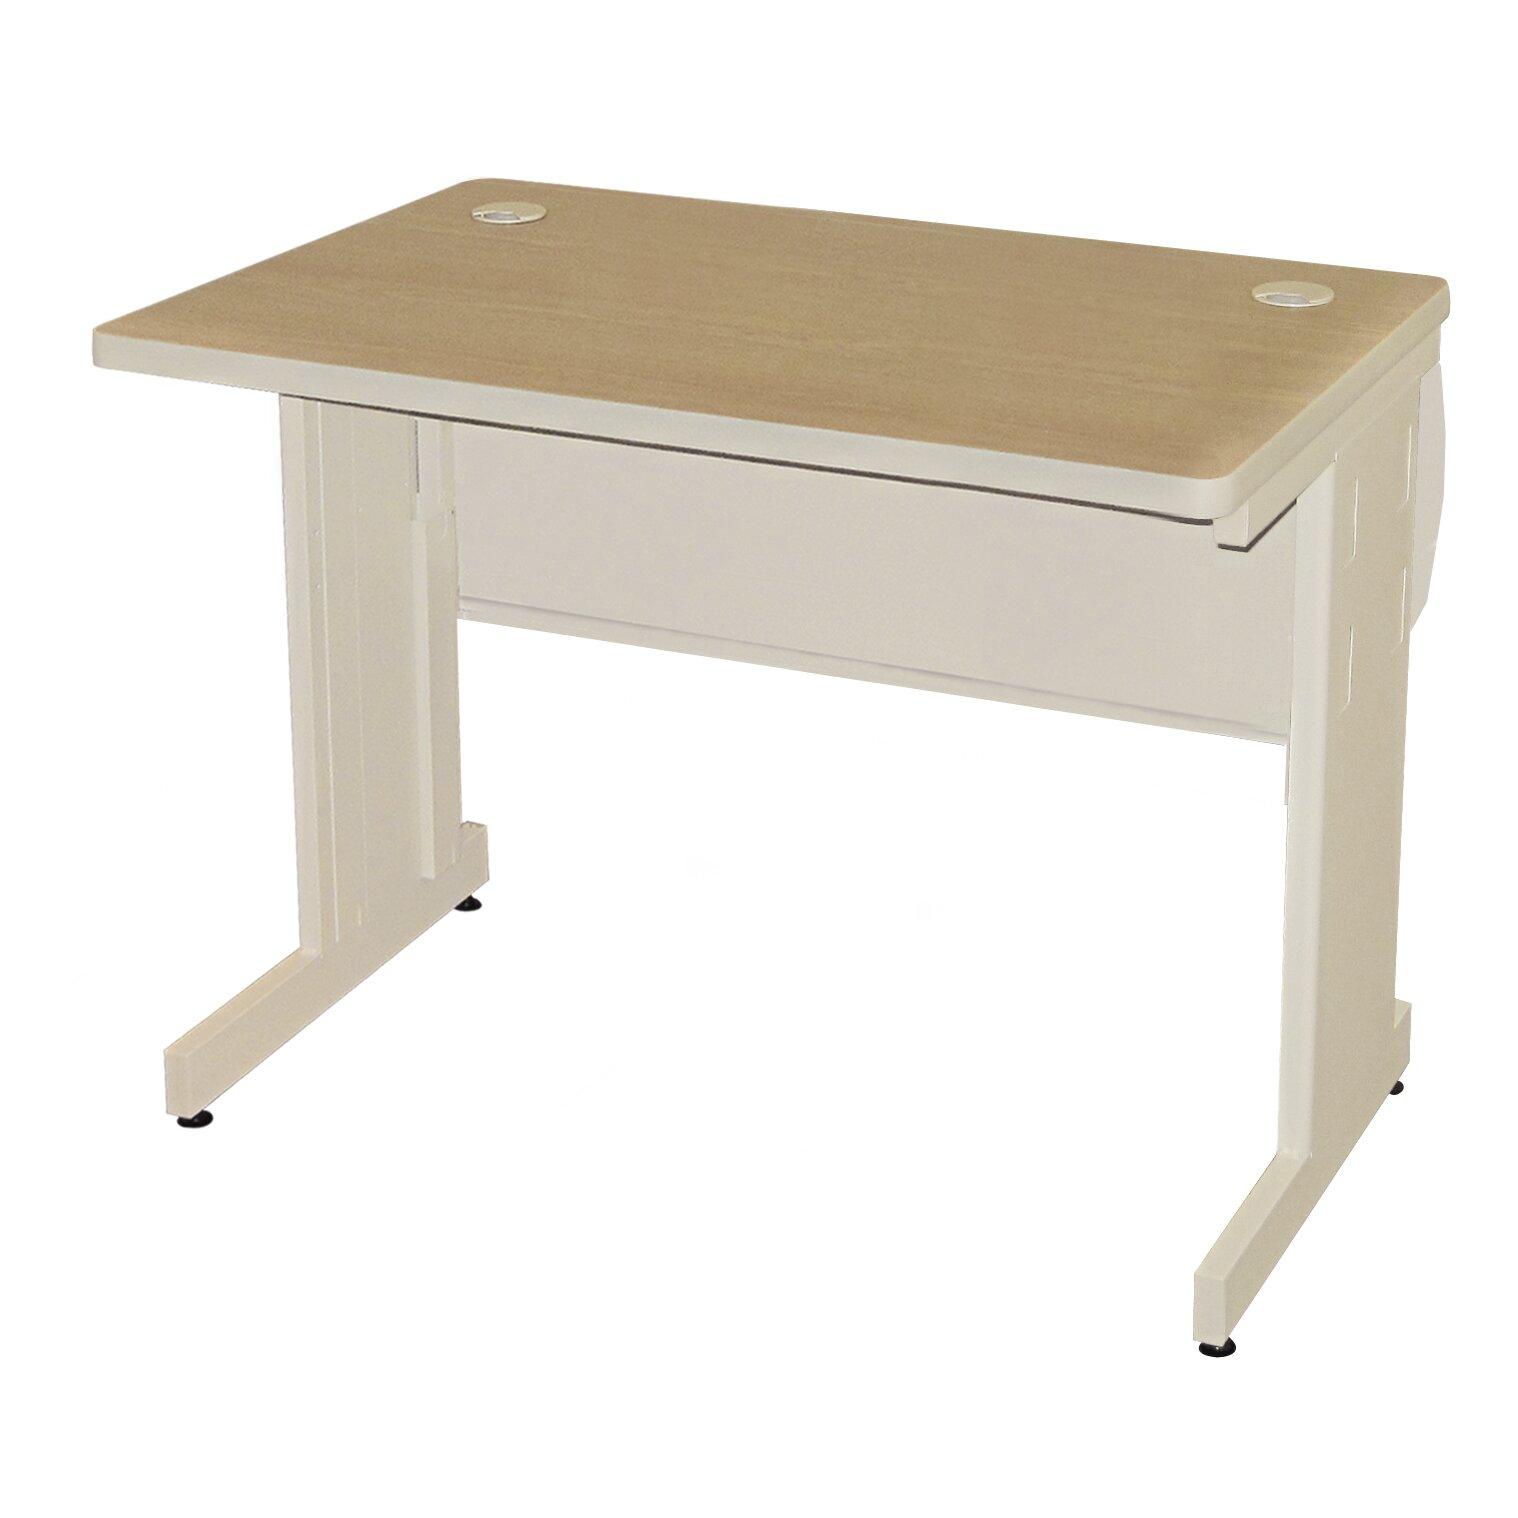 Wayfair supply furniture training tables marvel office furniture